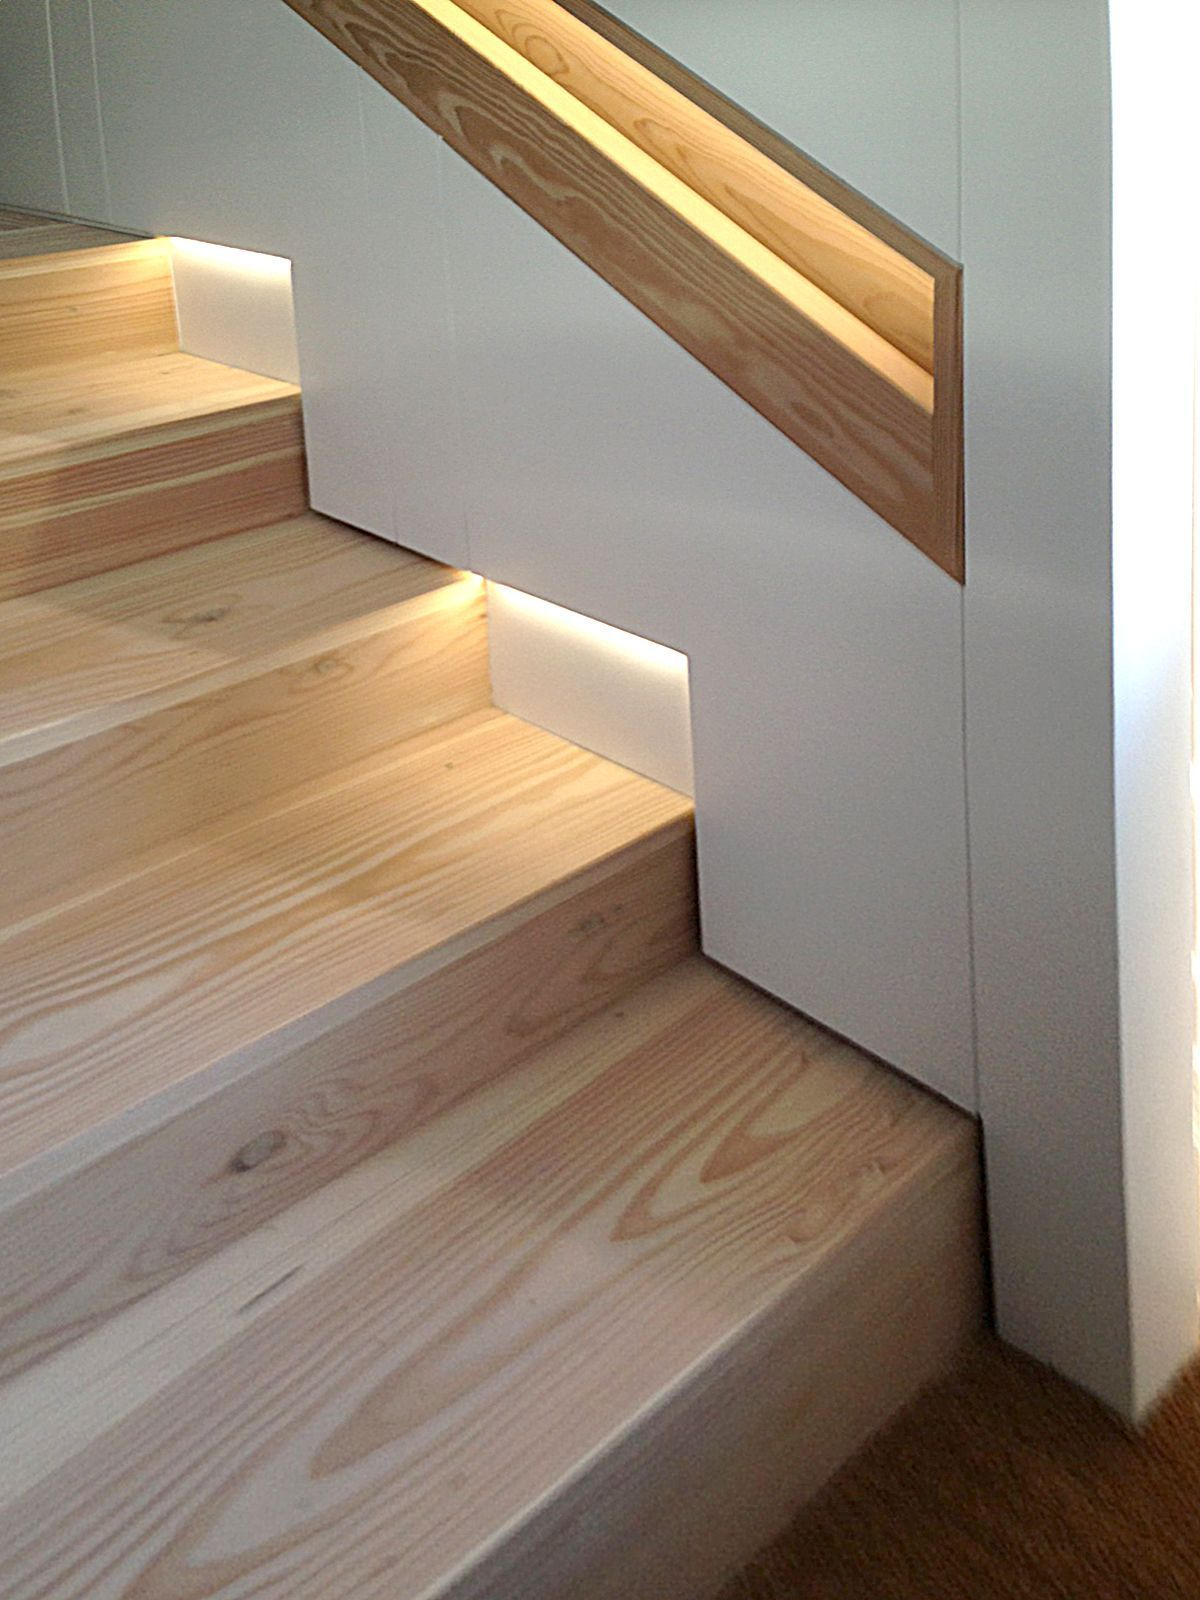 Pin Von Karl Auf Led Treppenbeleuchtung Treppendekor Treppe Holz Treppe Haus